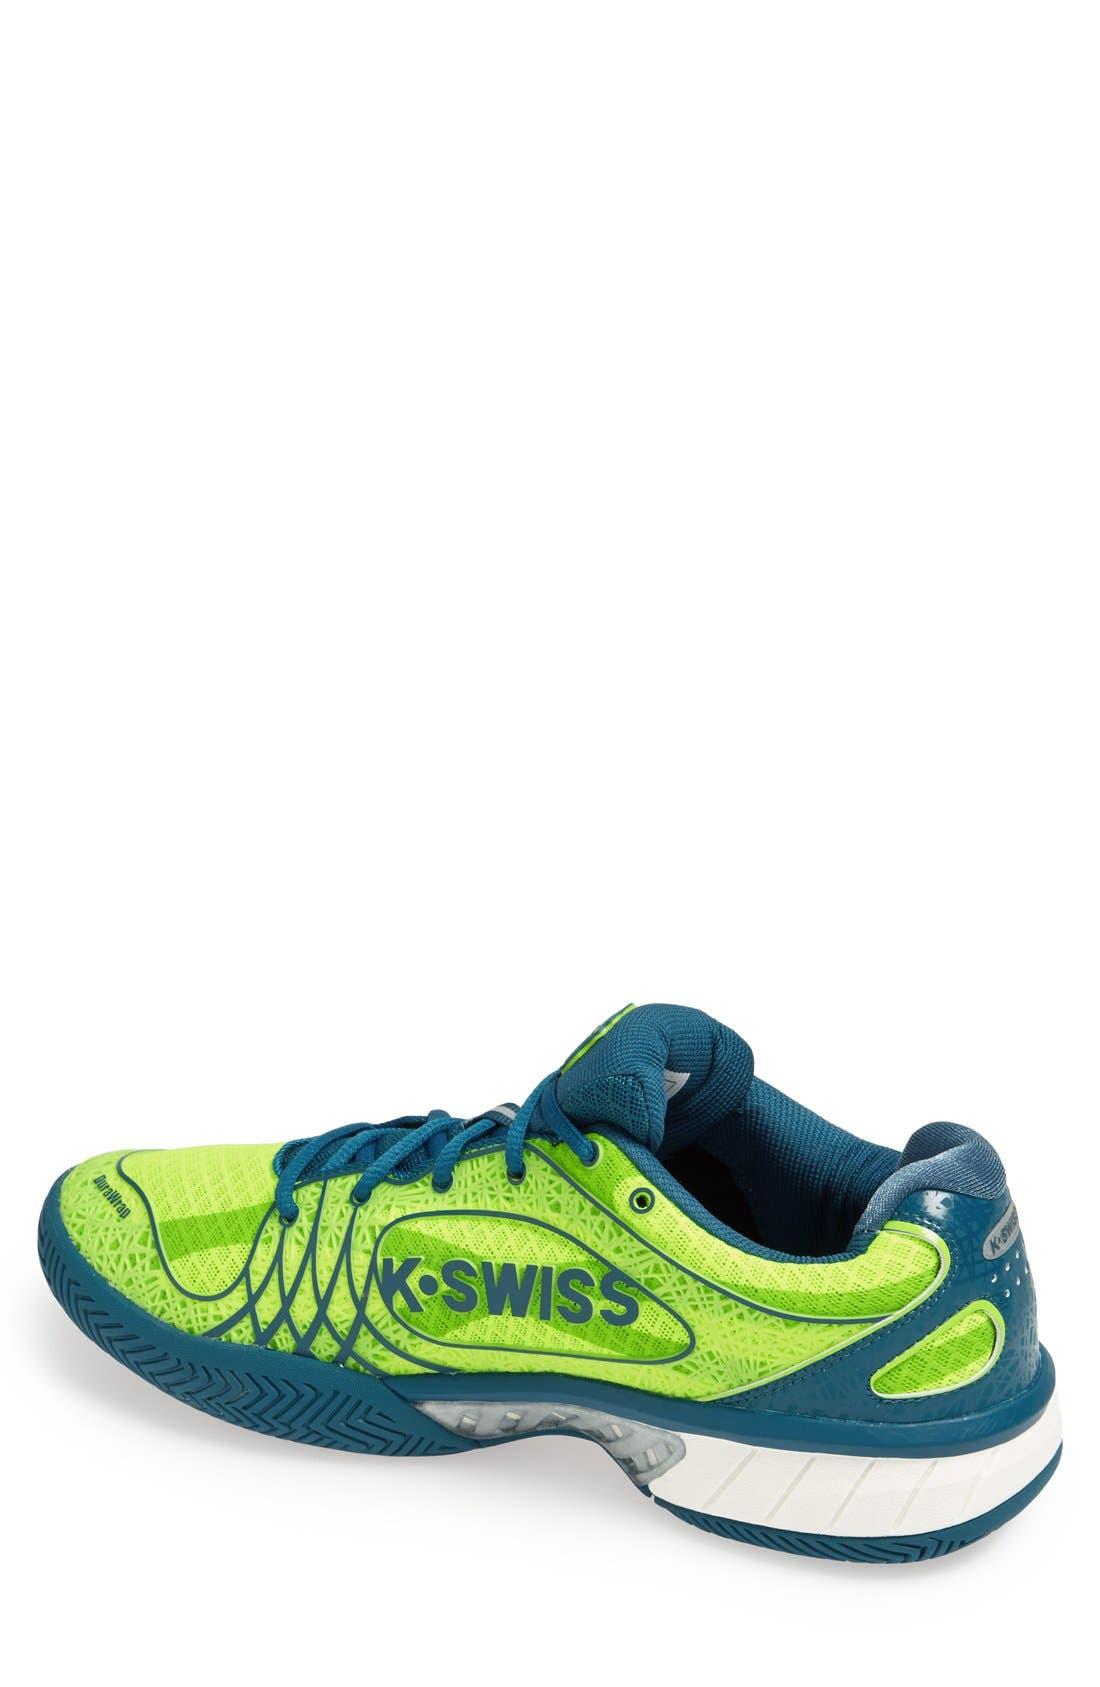 Alternate Image 2  - K-Swiss 'Ultra Express' Tennis Shoe (Men)